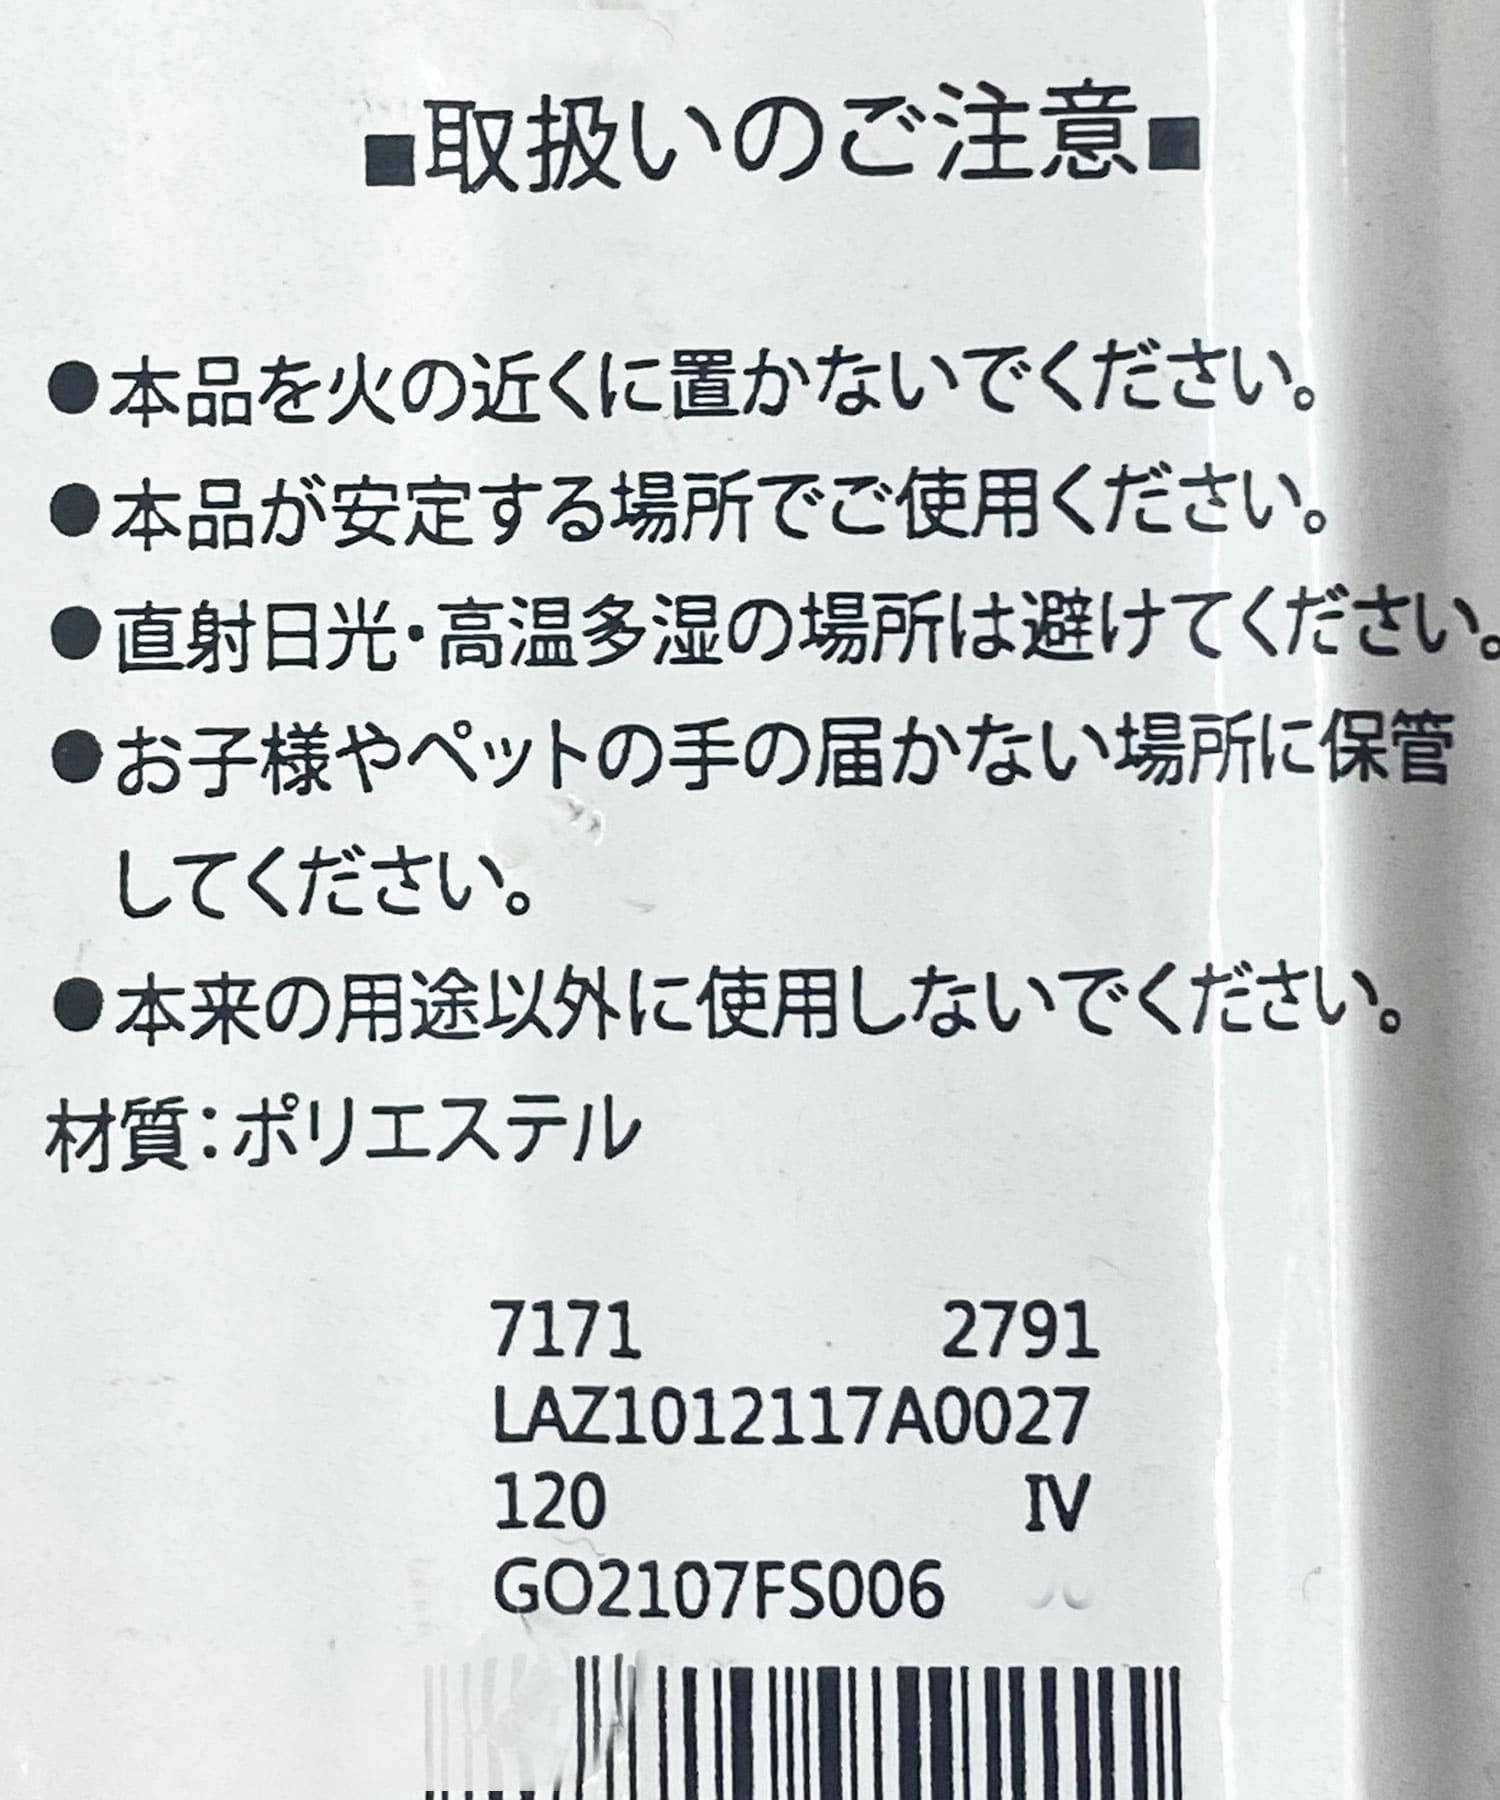 Lattice(ラティス) 【魅せる収納♡】スクエアアクセサリースタンド